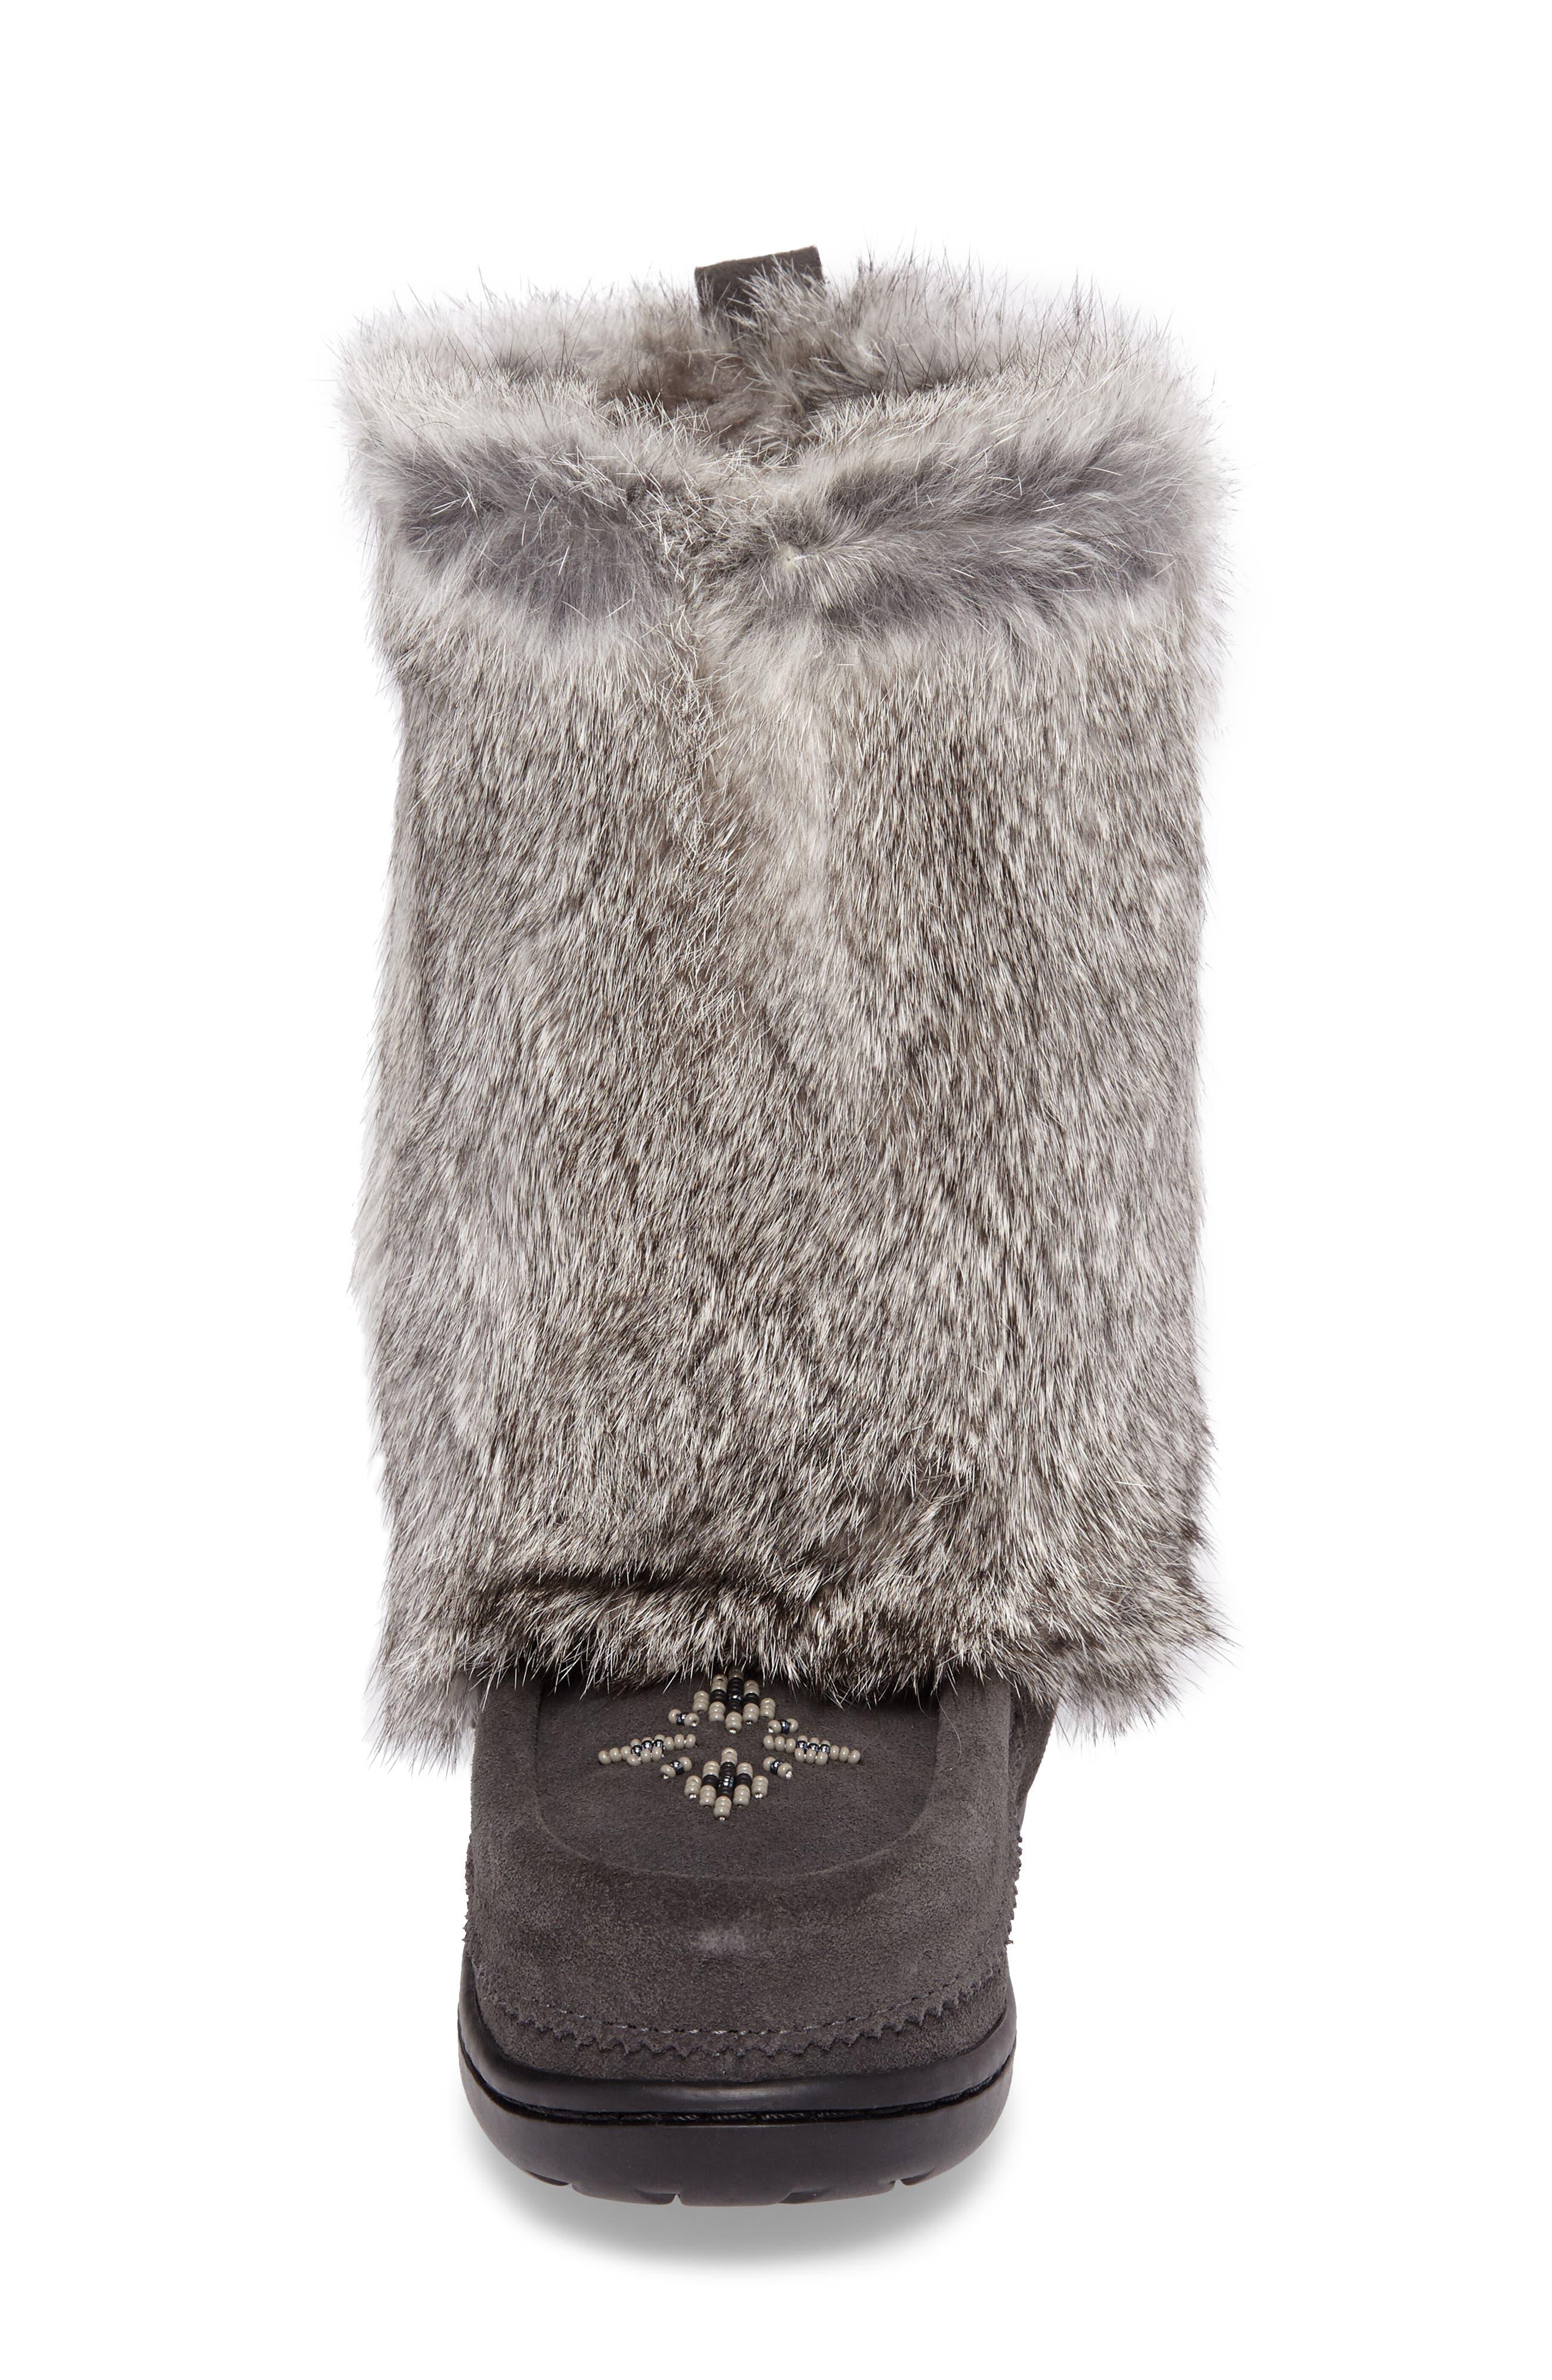 Nordic Genuine Rabbit Fur & Genuine Shearling Mukluk Boot,                             Alternate thumbnail 4, color,                             021